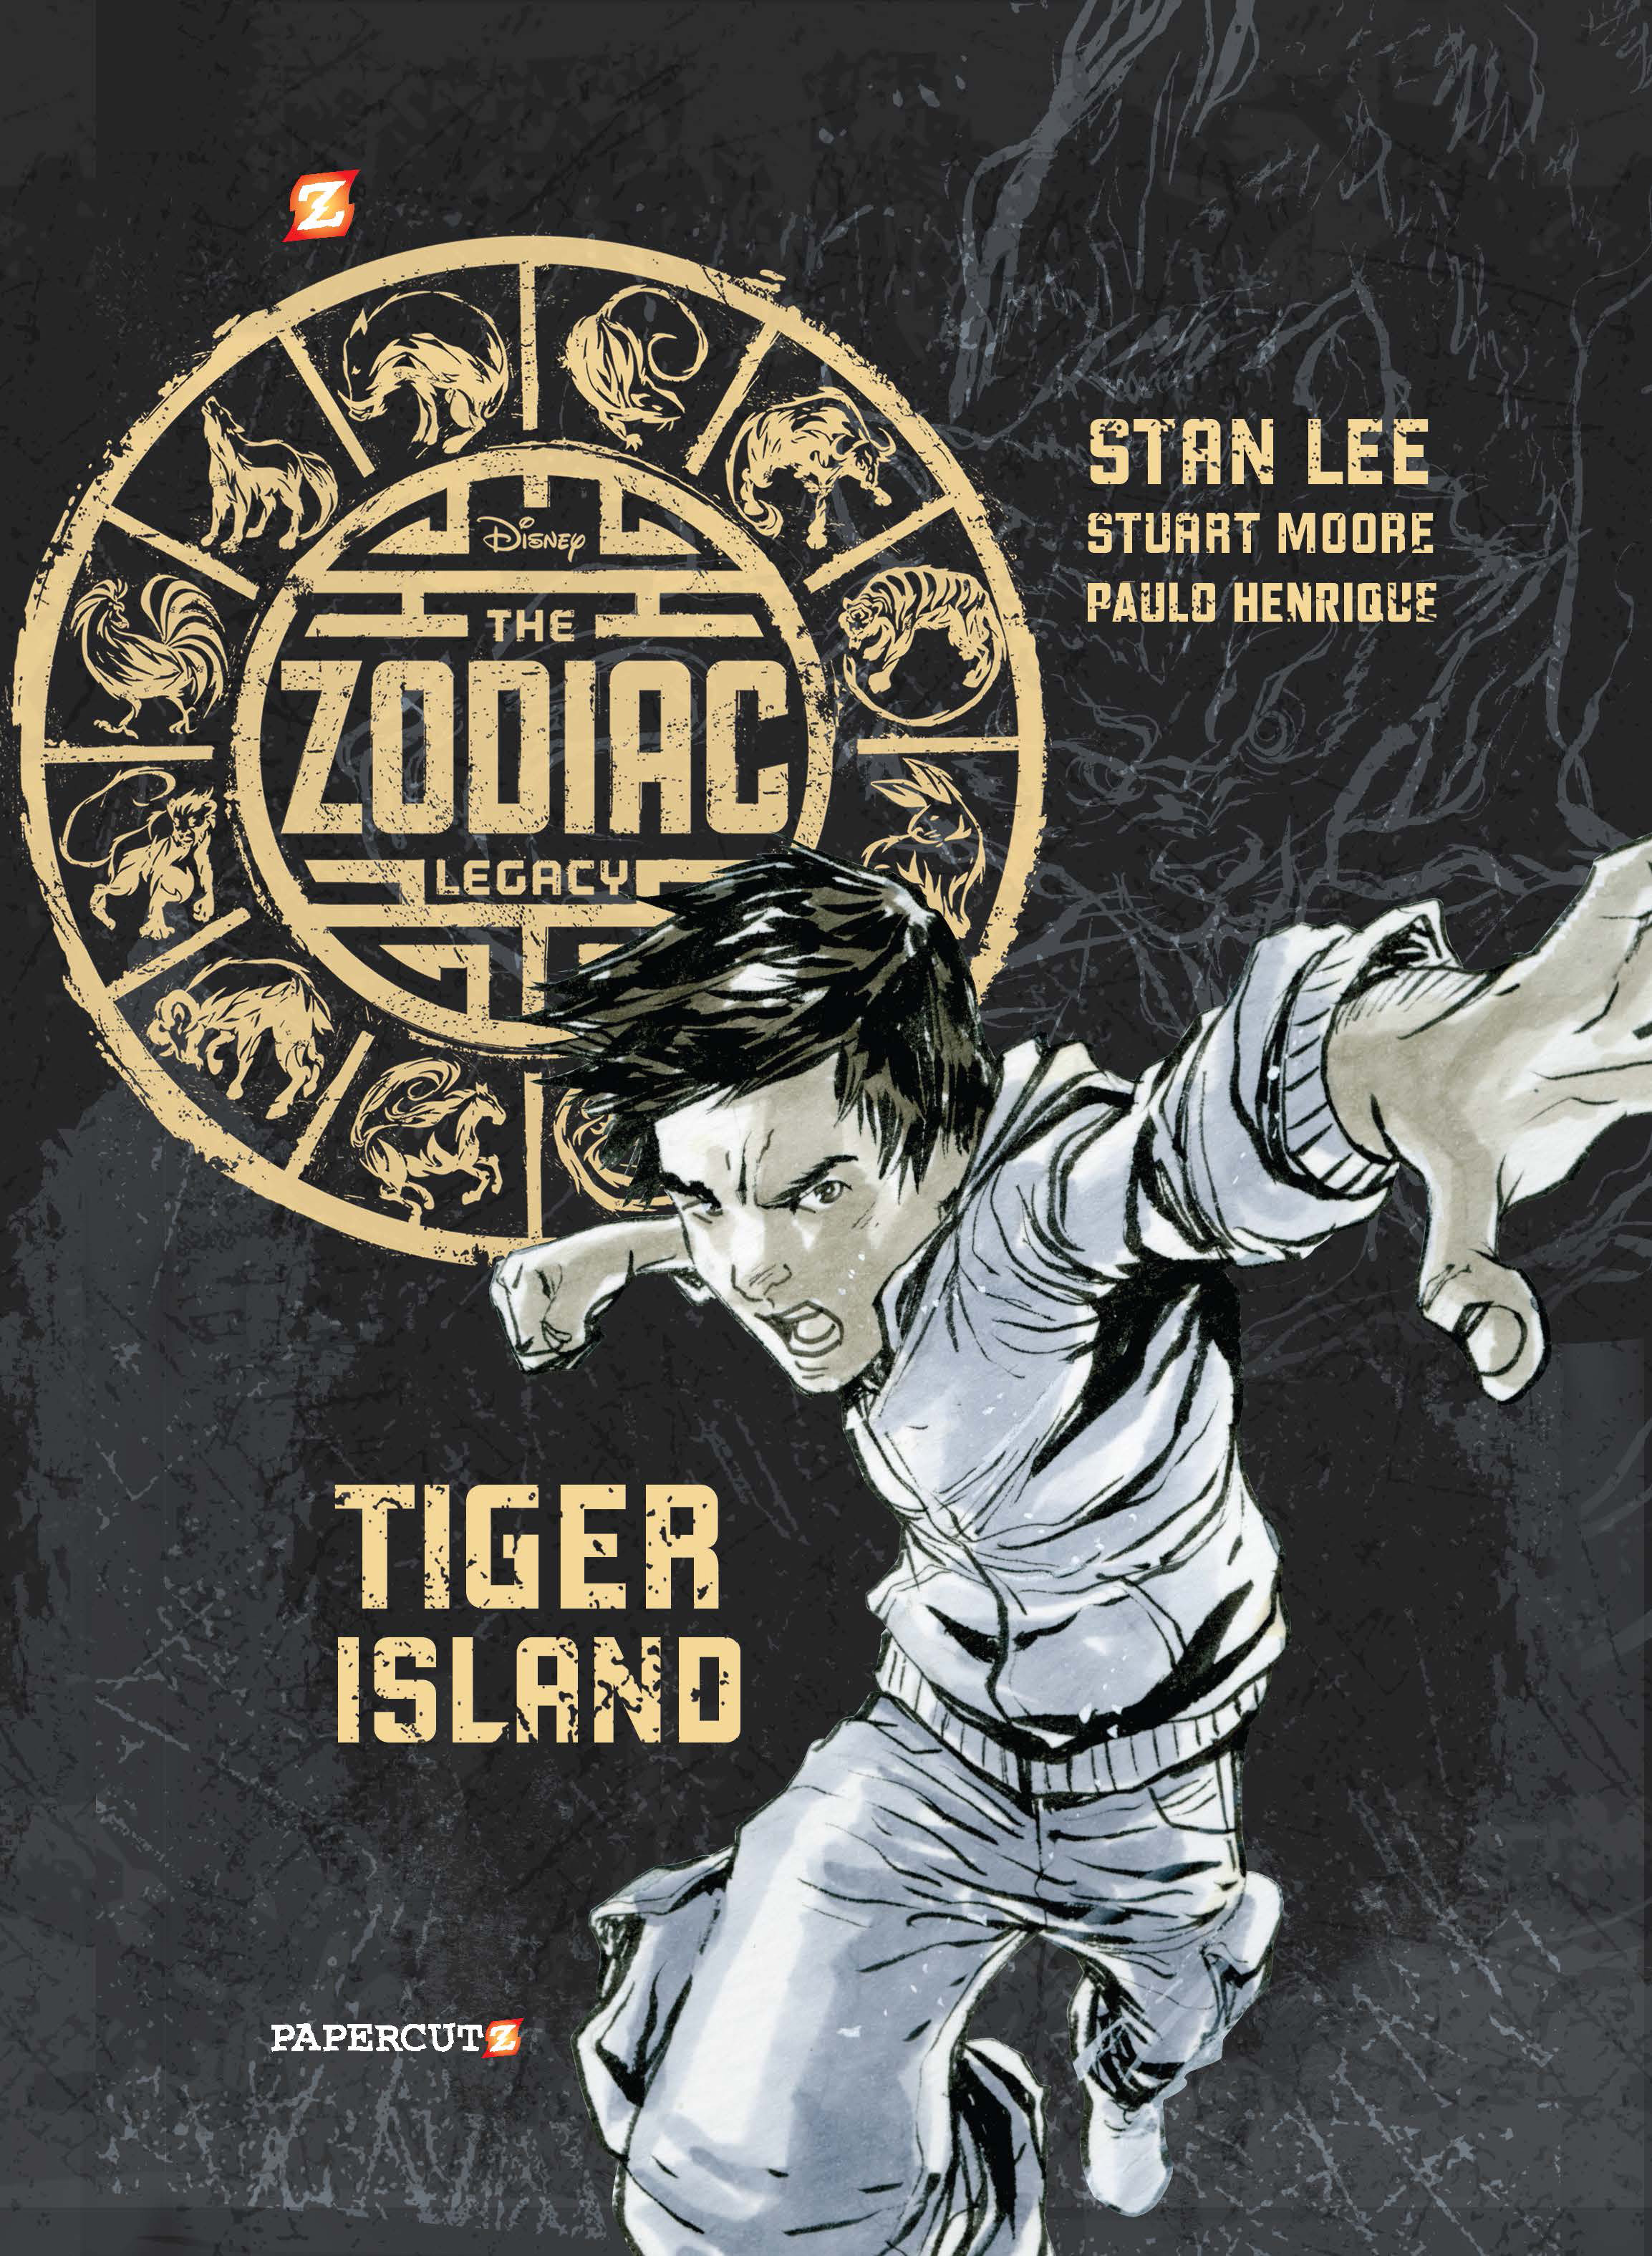 The Zodiac Legacy #1: Tiger Island